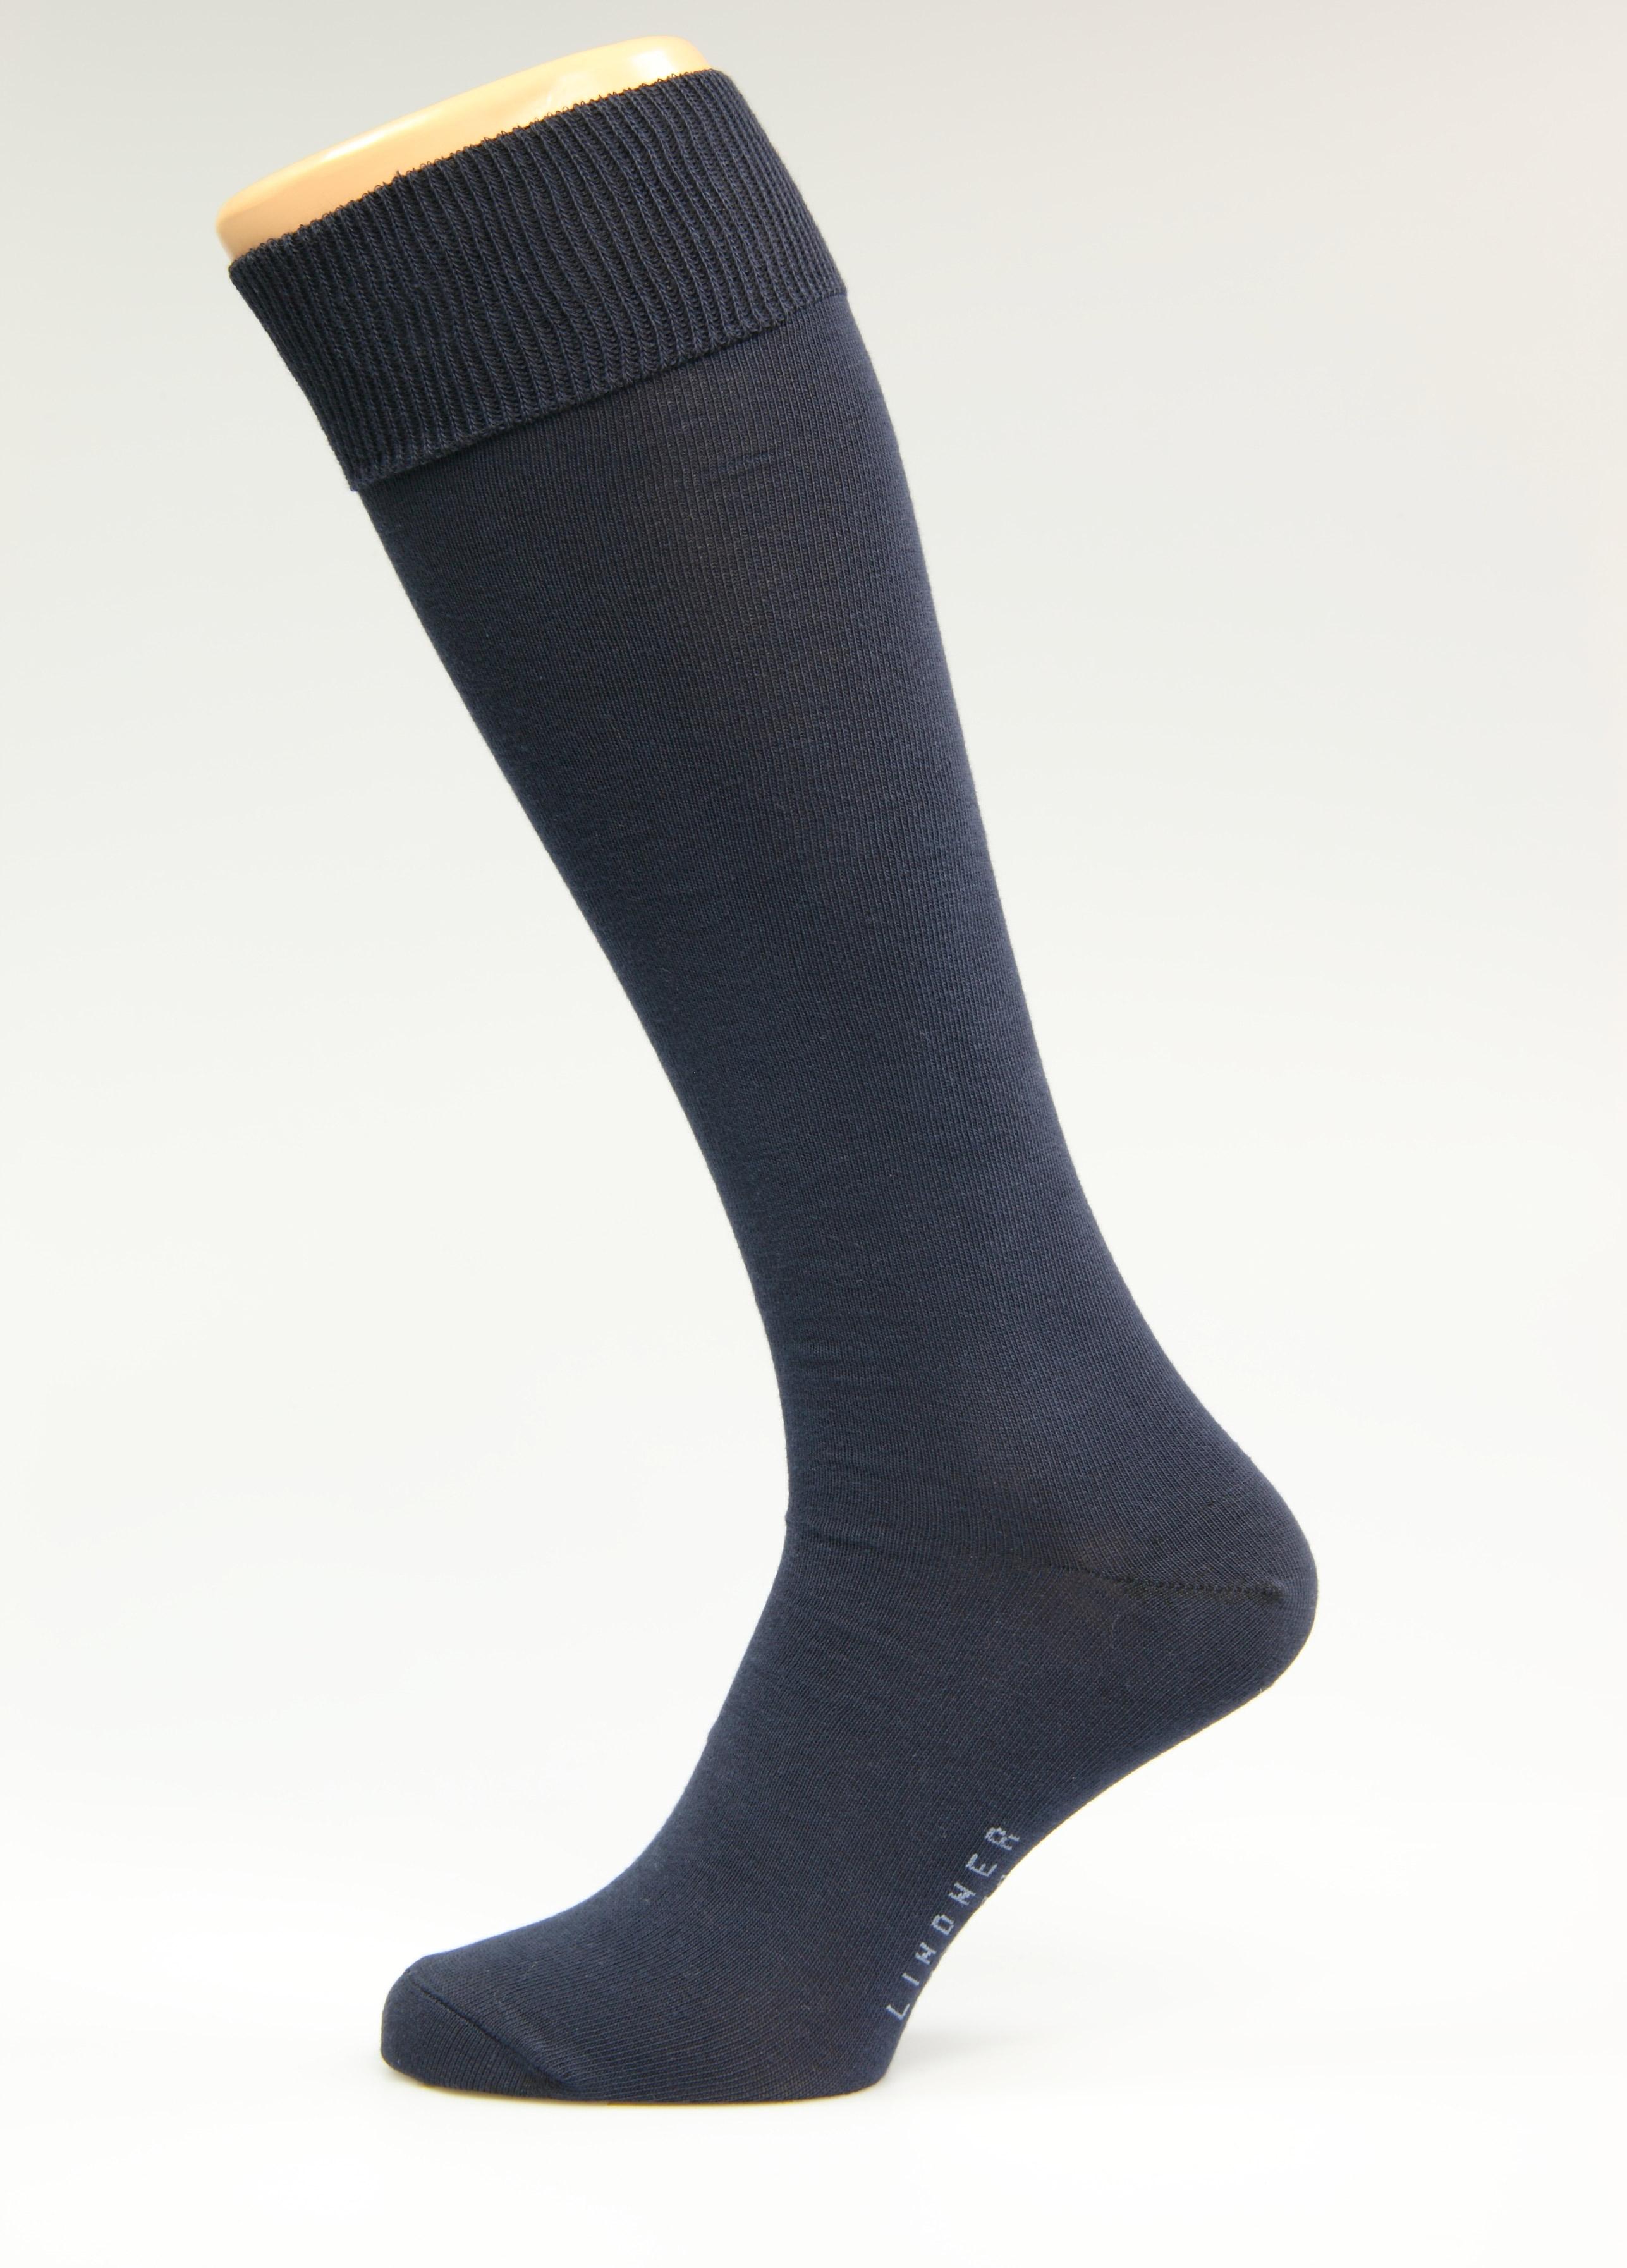 dunkelblaue-Kniestr-mpfe-Gr-sse-36-38